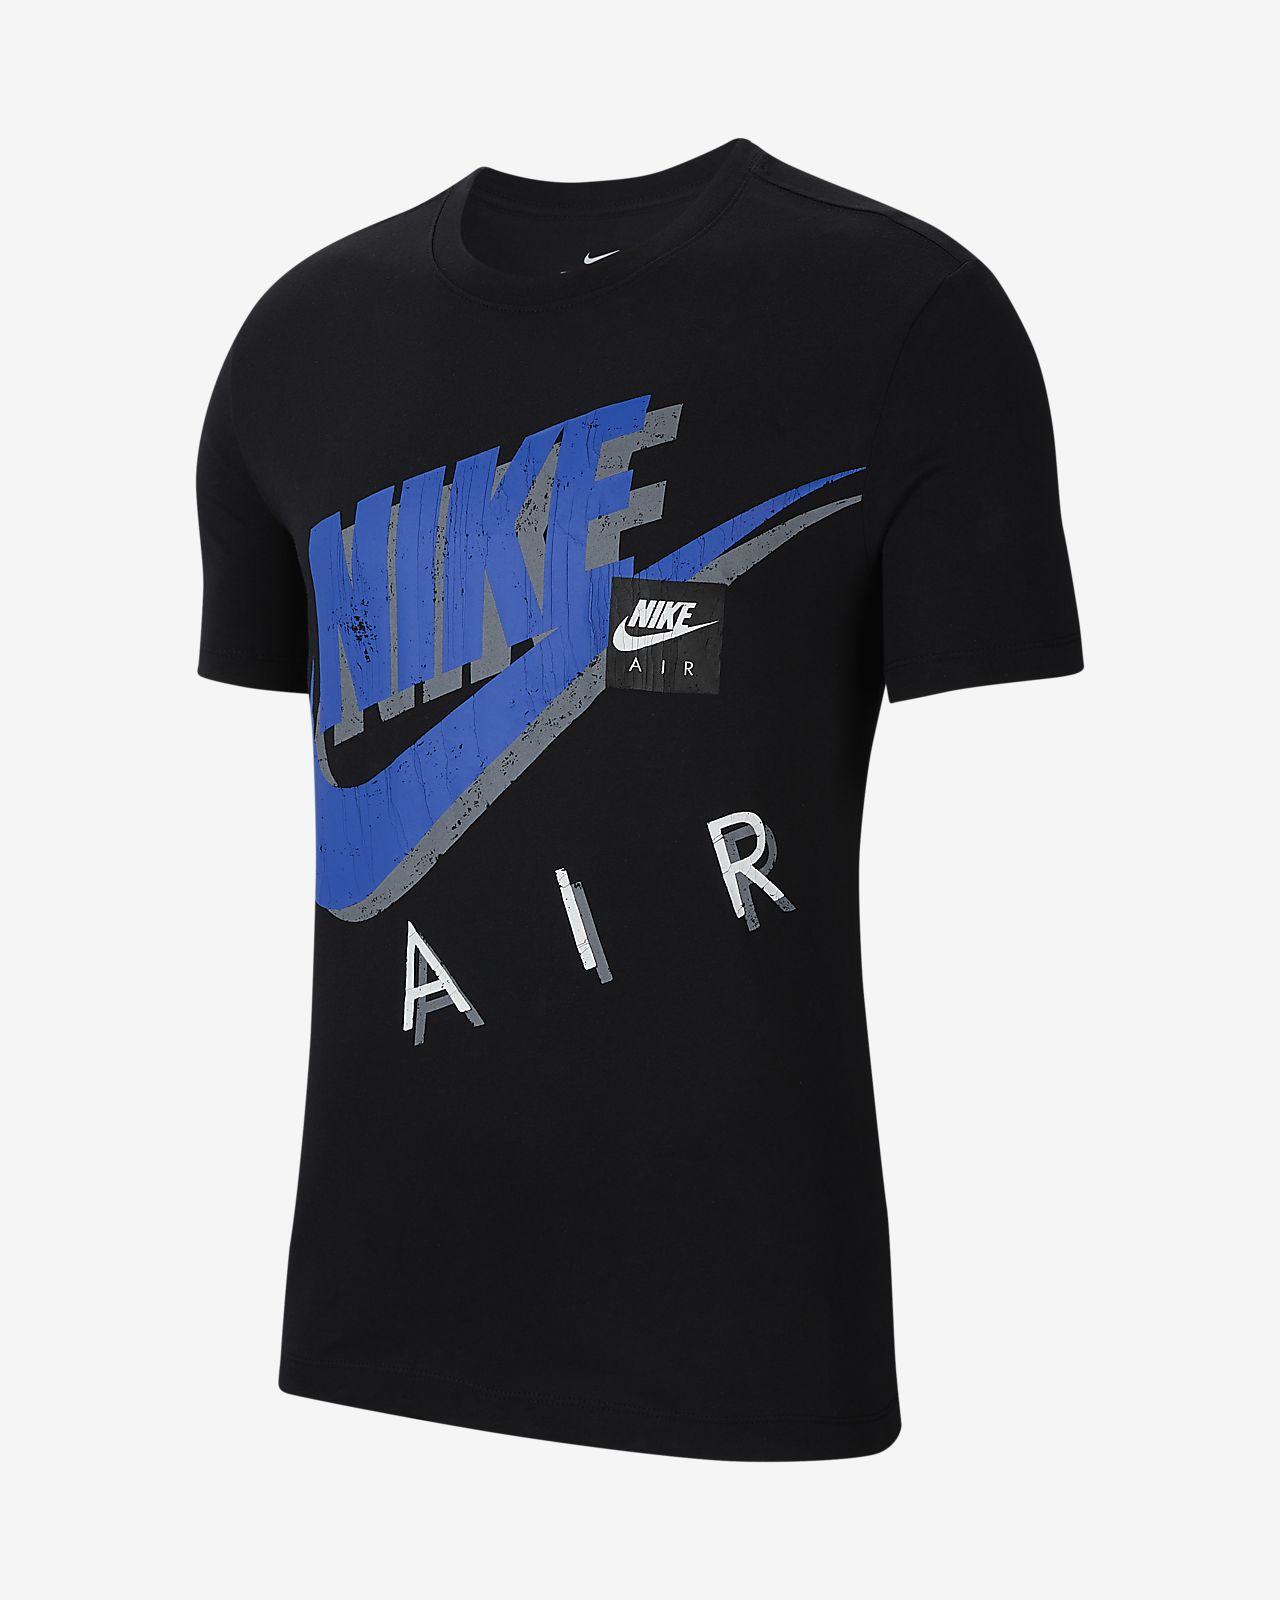 Nike Sportswear Camiseta de manga corta con estampado - Hombre